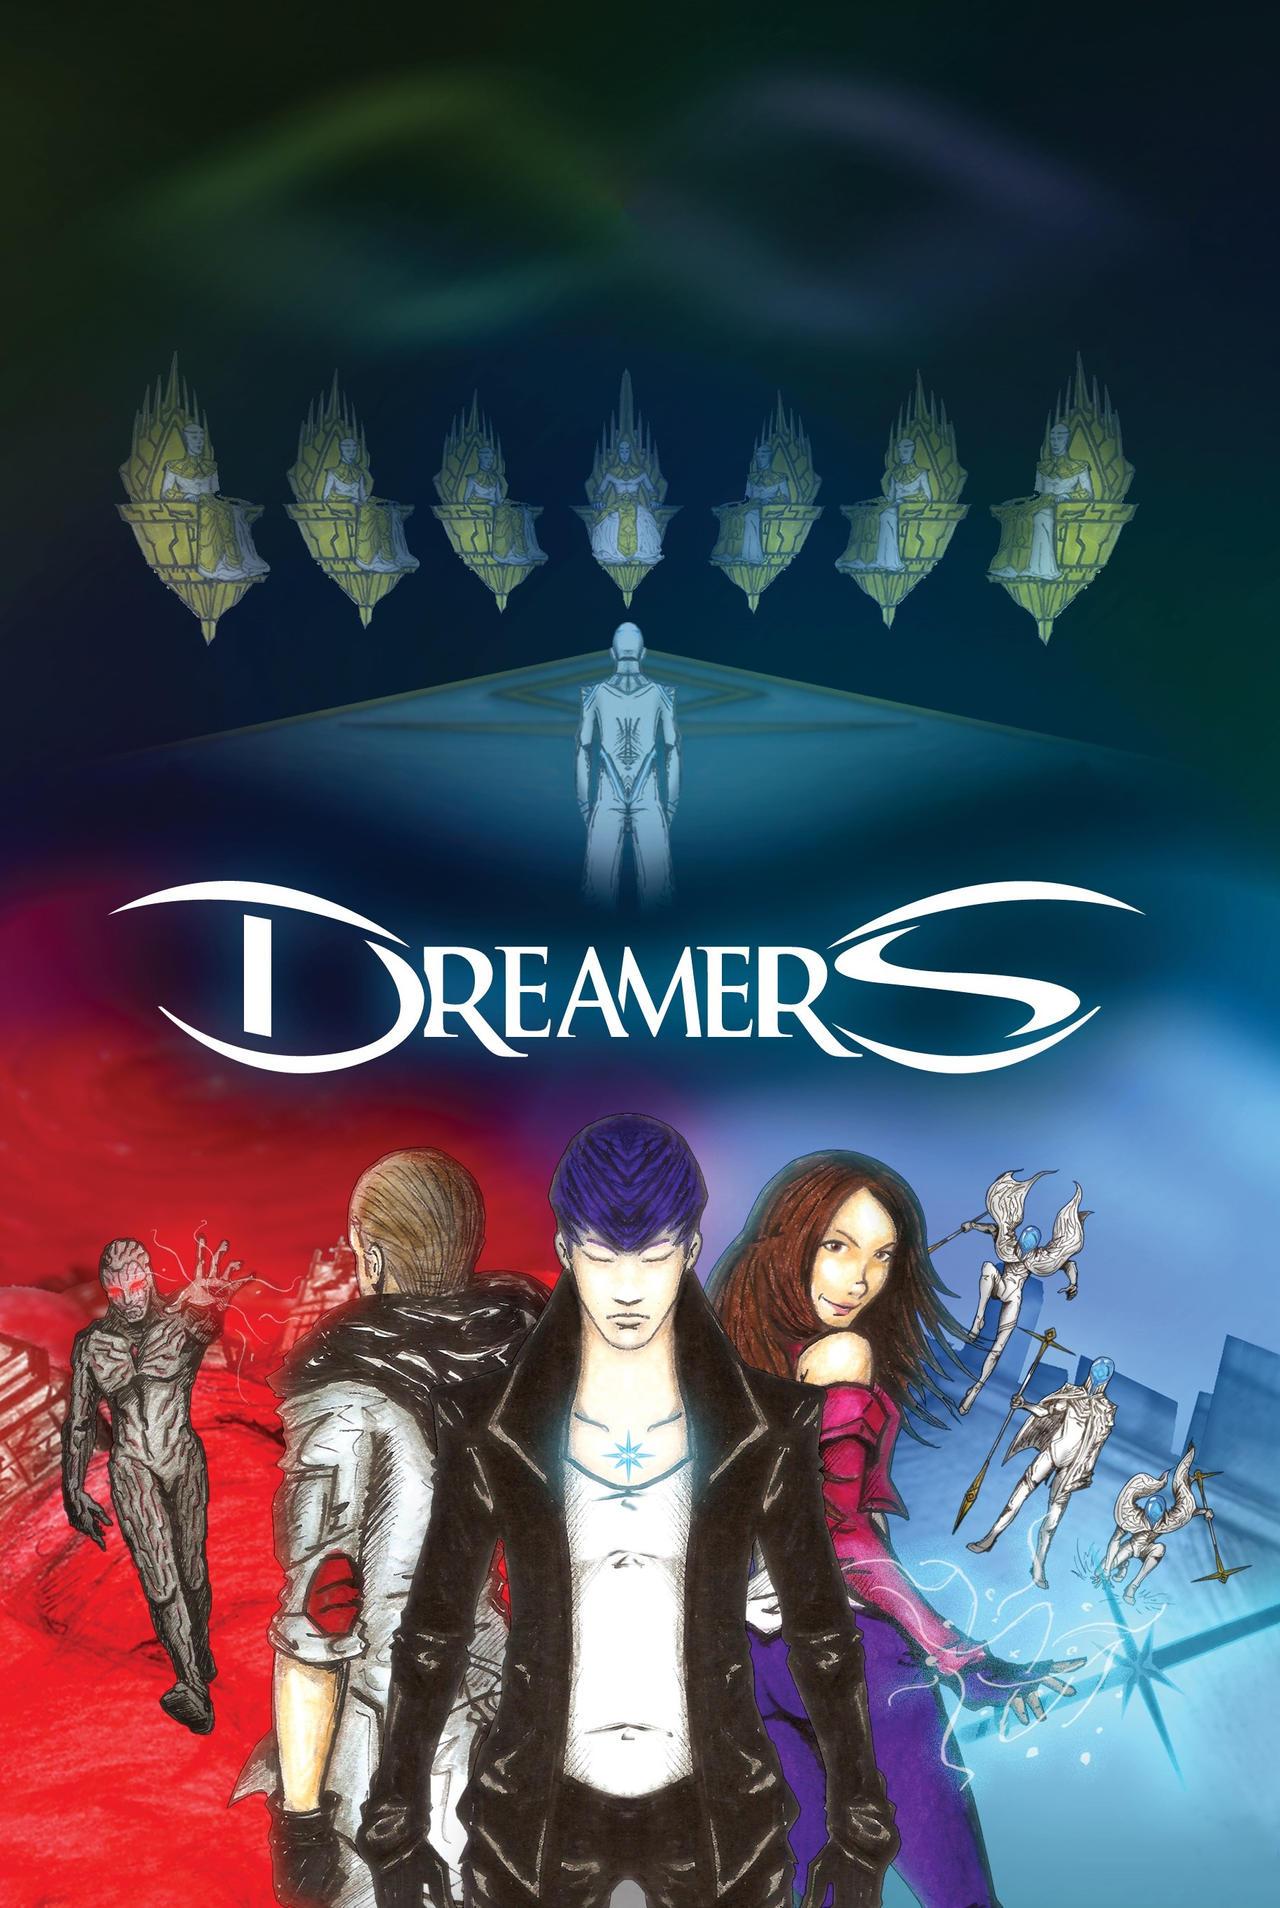 DREAMERS (Graphic Novel) cover art (2021)